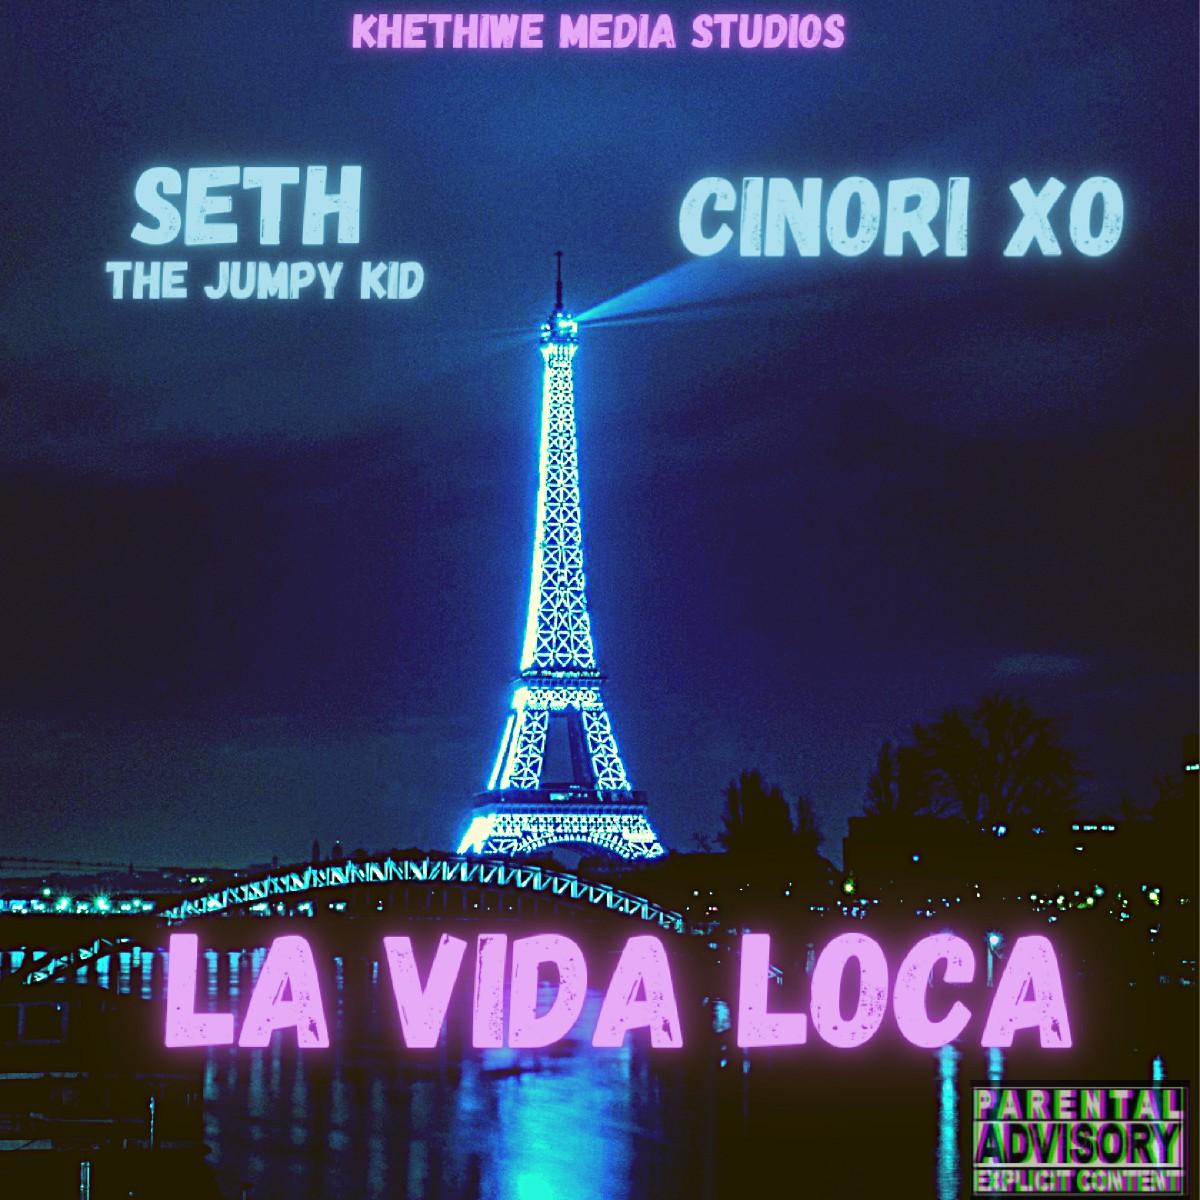 Seth the Jumpy Kid ft. Cinori XO - La Vida Loca